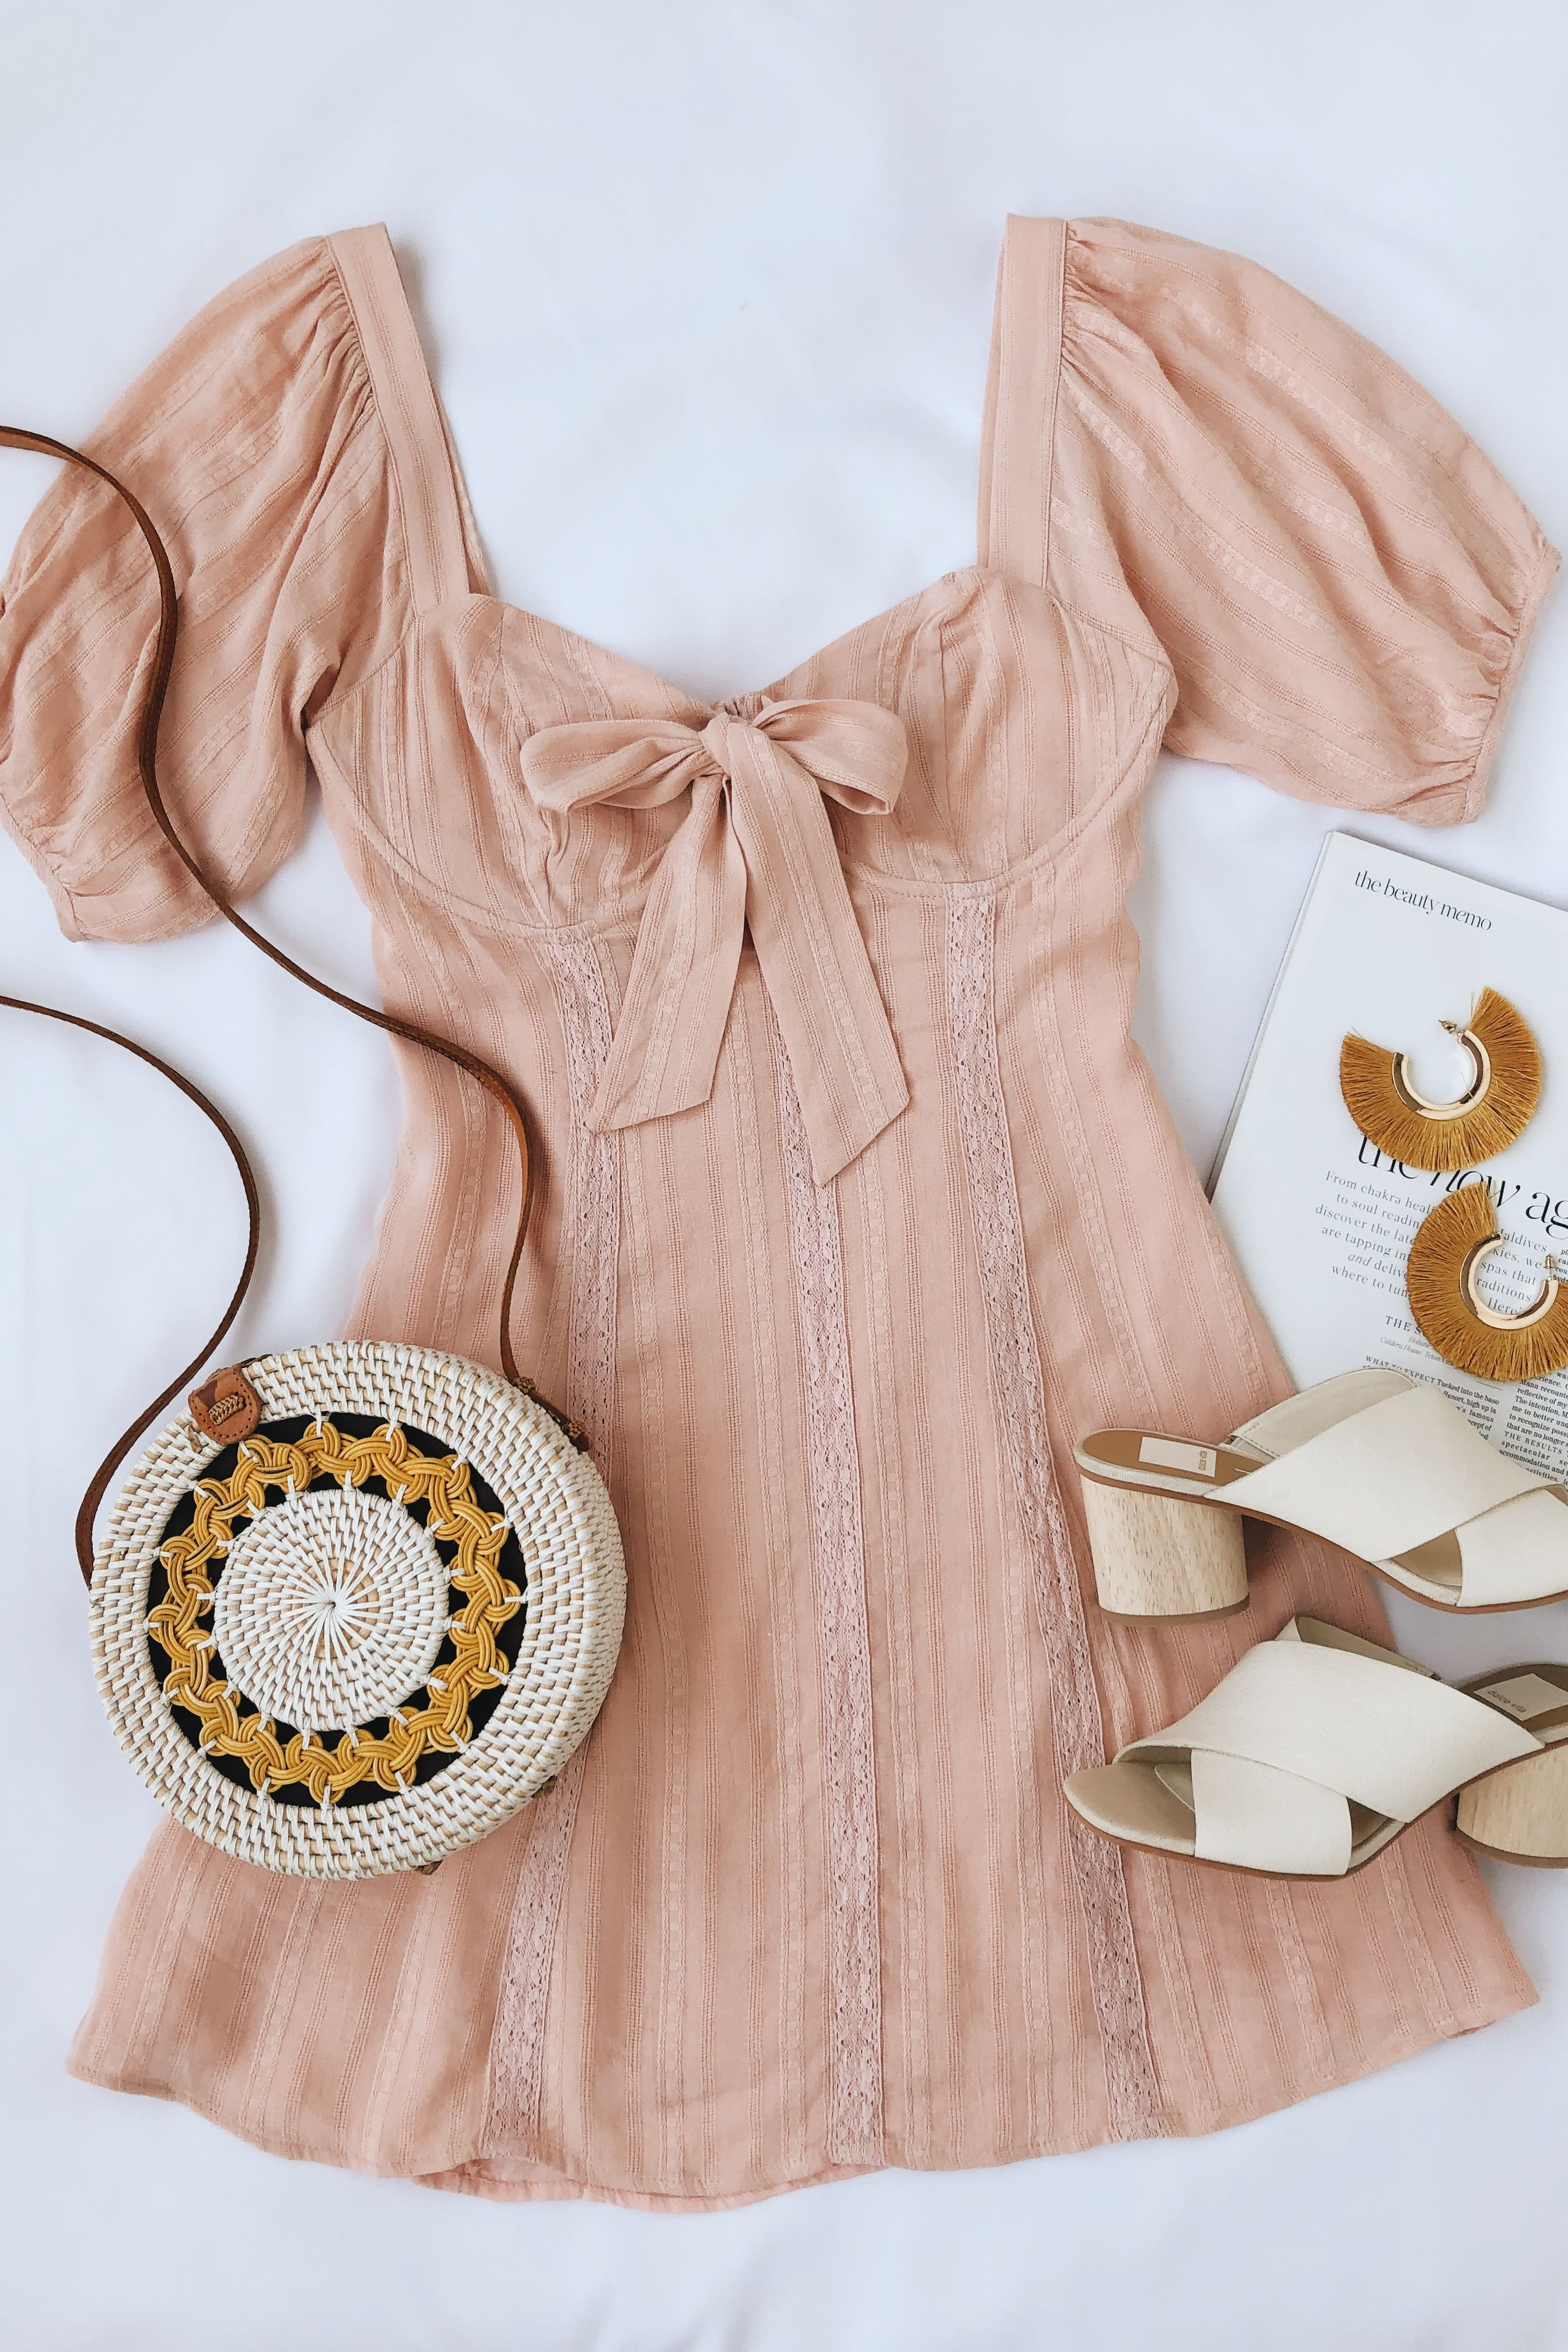 ee260b1c4a2b Cute pink puff sleeve mini dress.  springfashion  springoutfits   minidresses  sundresses